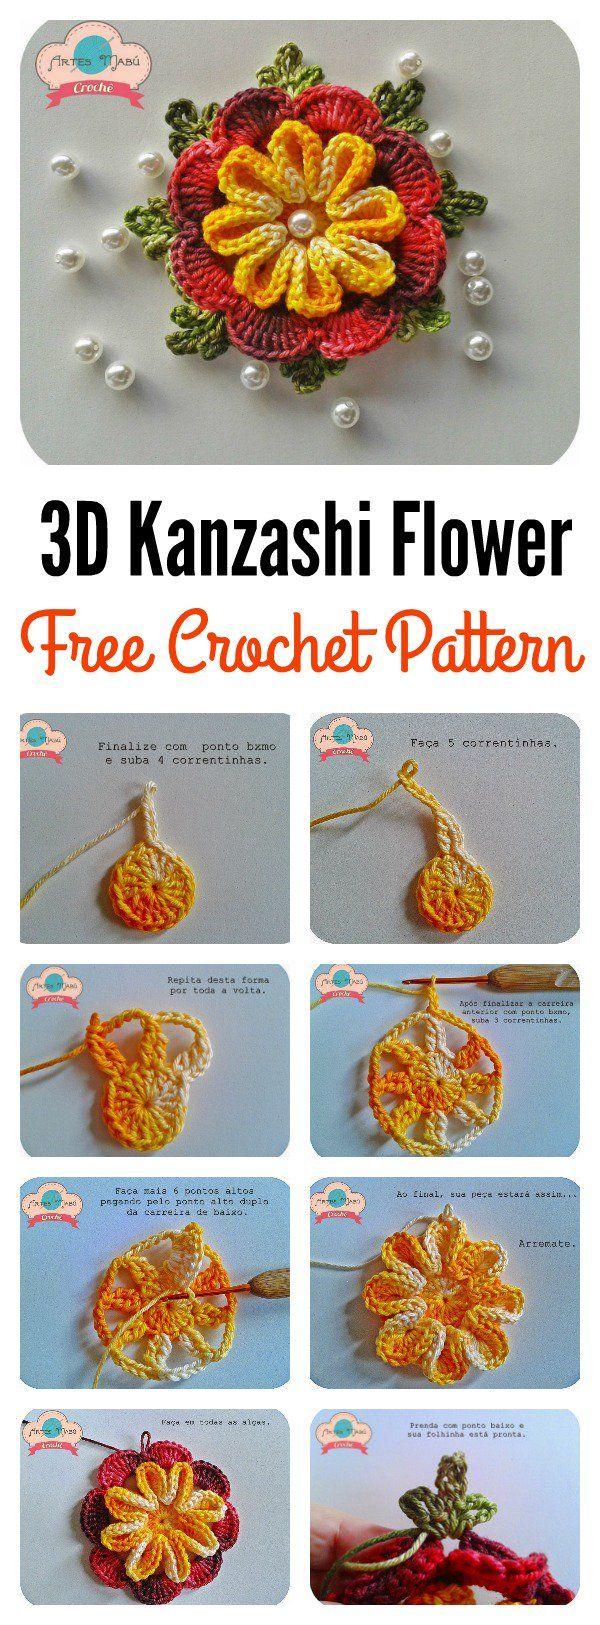 3D Kanzashi Flower Free Crochet Pattern